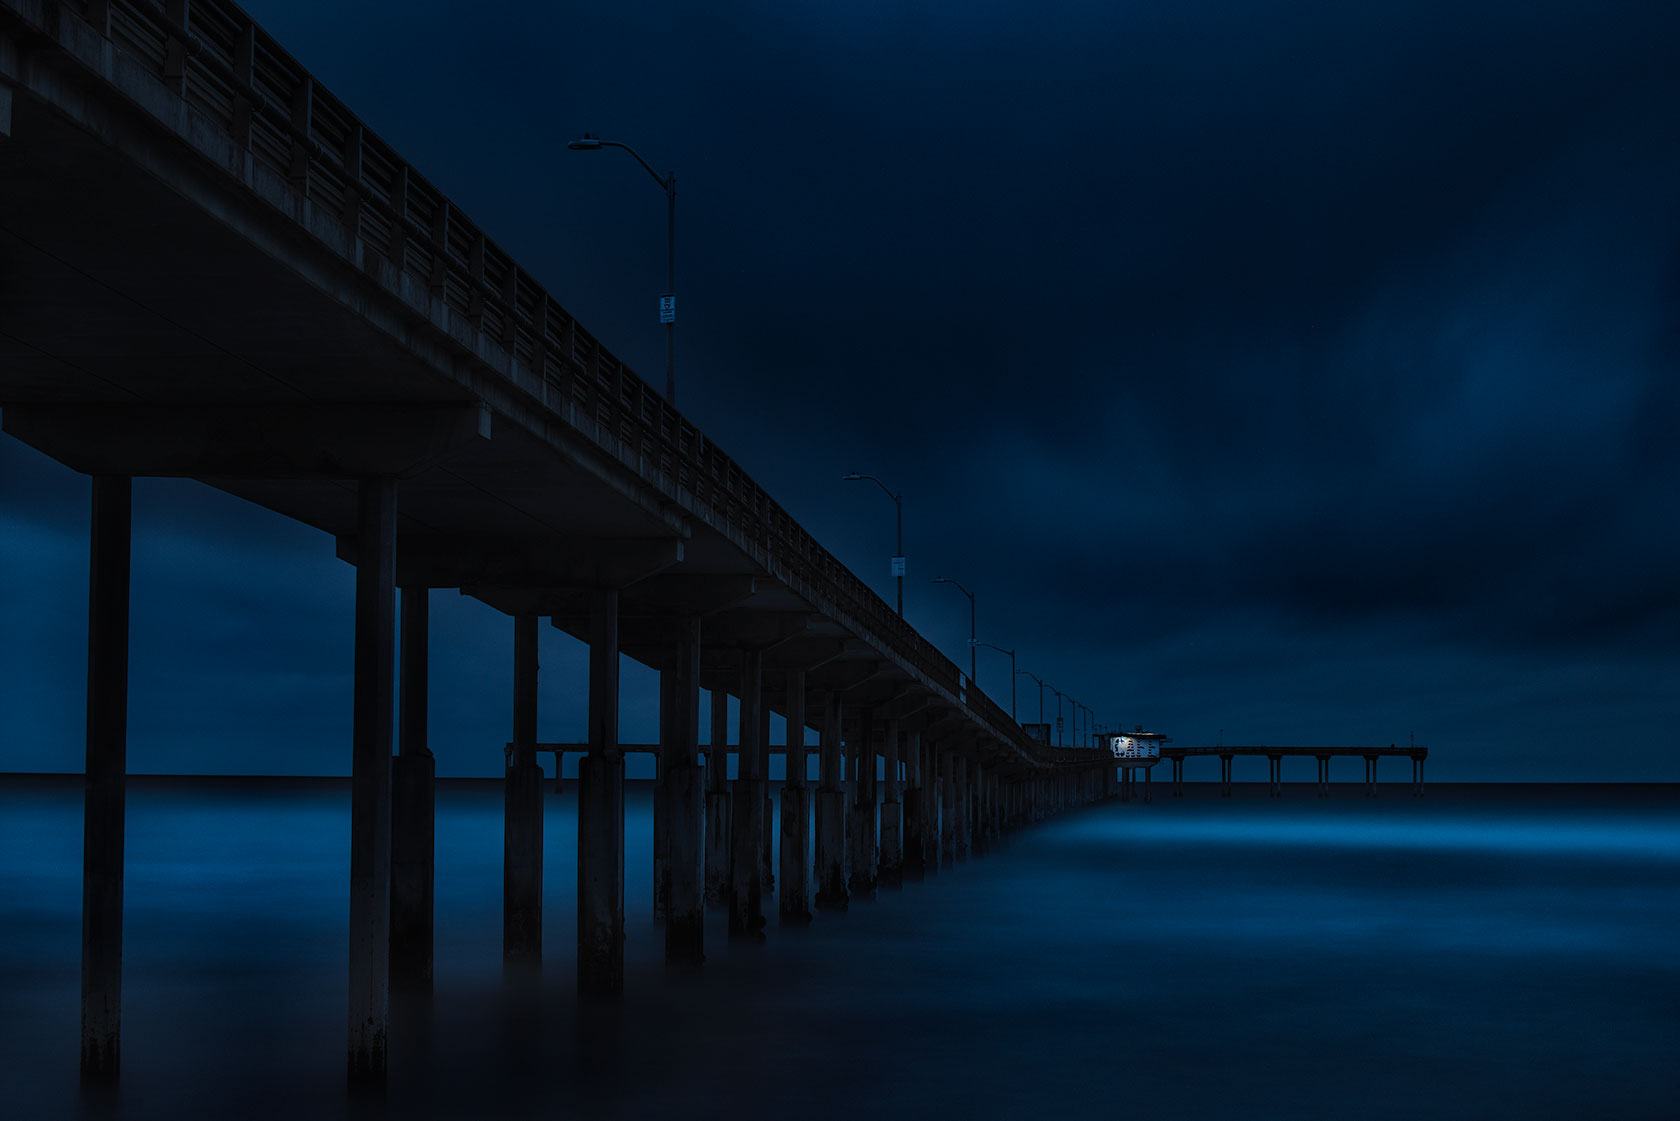 austin-trigg-southern-california-Ocean-beach-pier-san-diego-long-exposure-night-cafe-beach.jpg